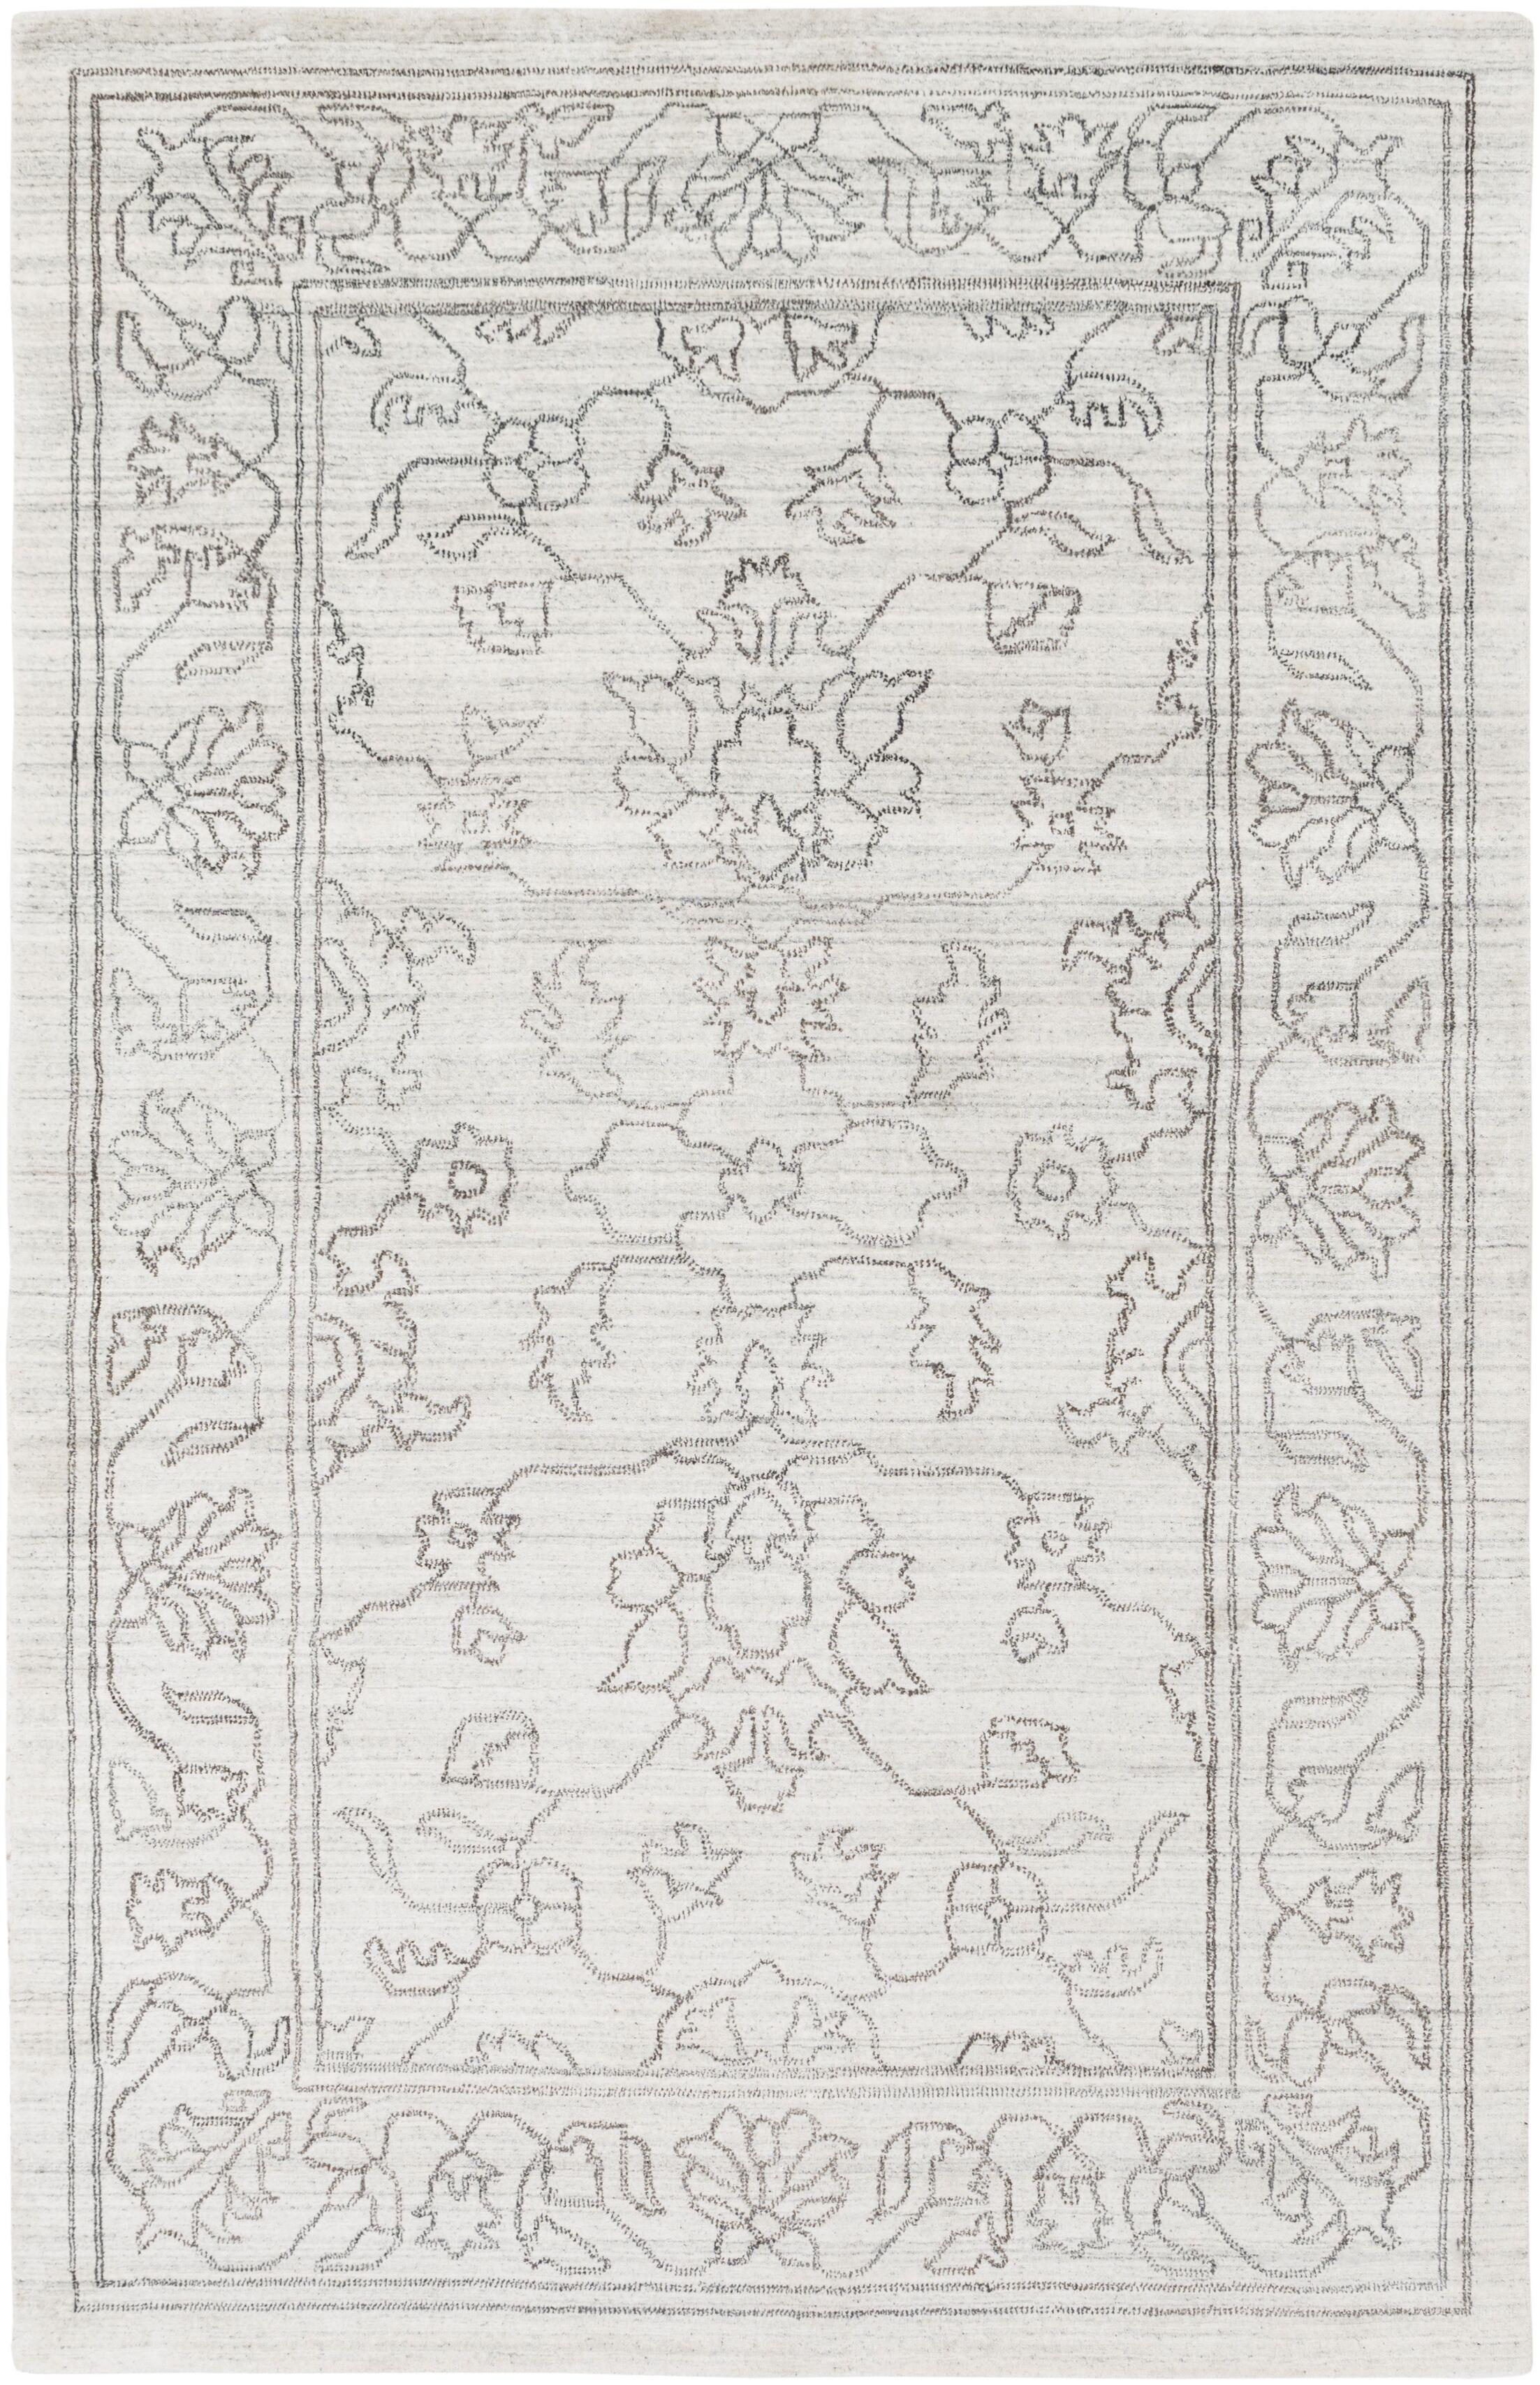 Gillian Hand-Woven Gray/Ivory Area Rug Rug Size: Rectangle 6' x 9'